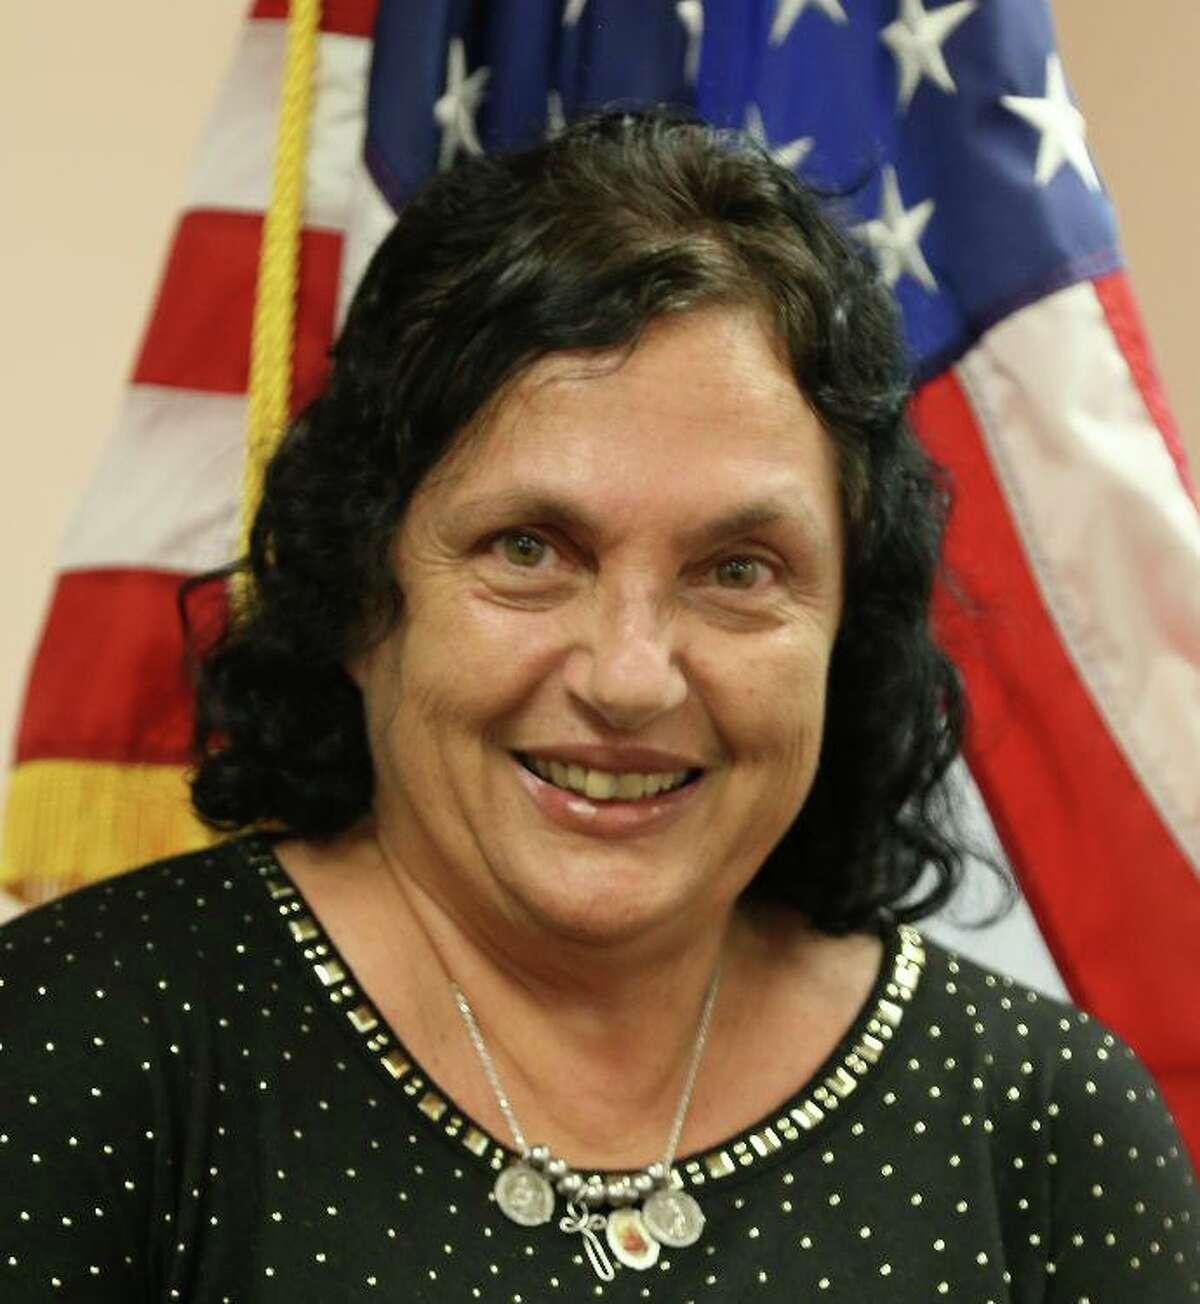 Camille Grande Kurtyka, wife of George Kurtyka, a longtime Board of Education member, will be taking the oath of office as a new Derby alderman on Dec. 7.